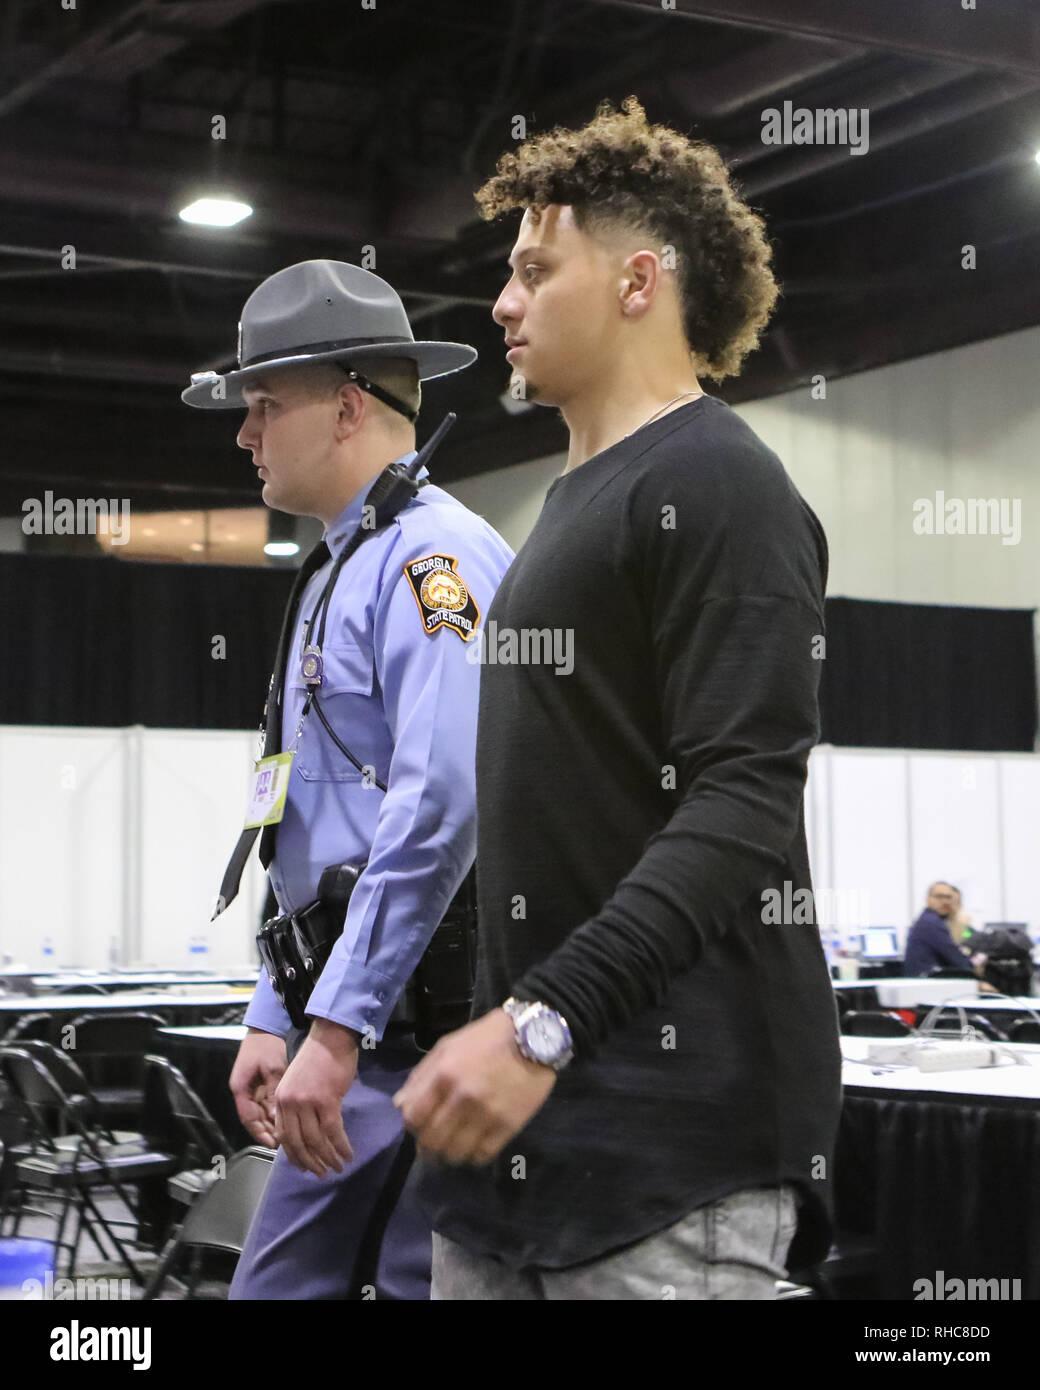 Atlanta, GA, USA. 1st Feb, 2019. Game Week with NFL Experience